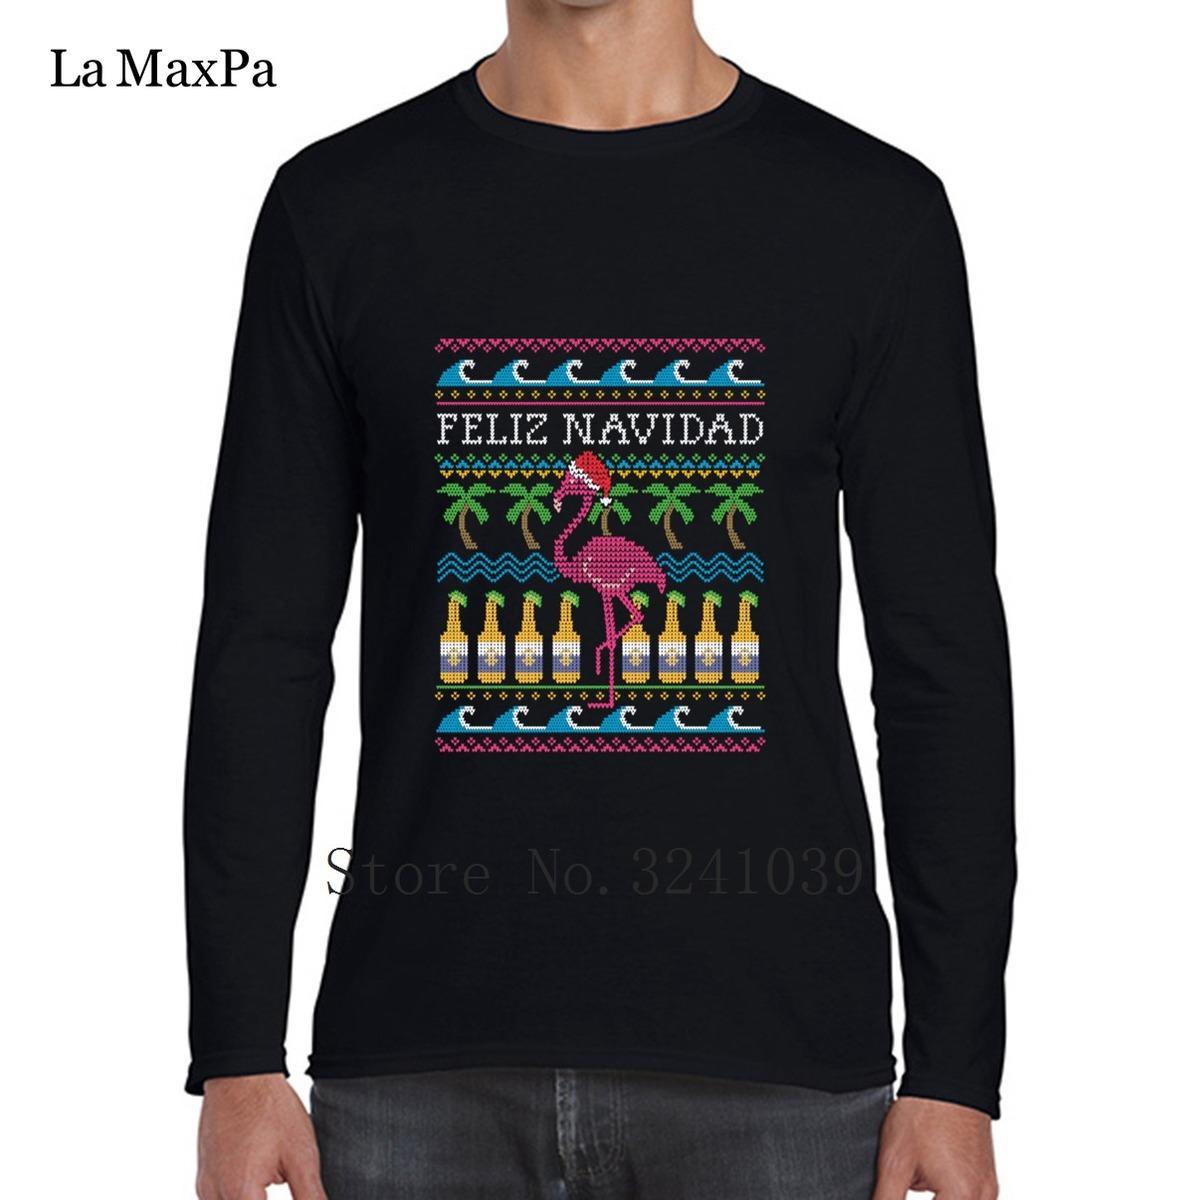 La Maxpa Humor Feliz Navidad hässliches Weihnachten T Shirt Trend 2018 Herren T-Shirt Kleidung Rundhals Herren T-Shirt